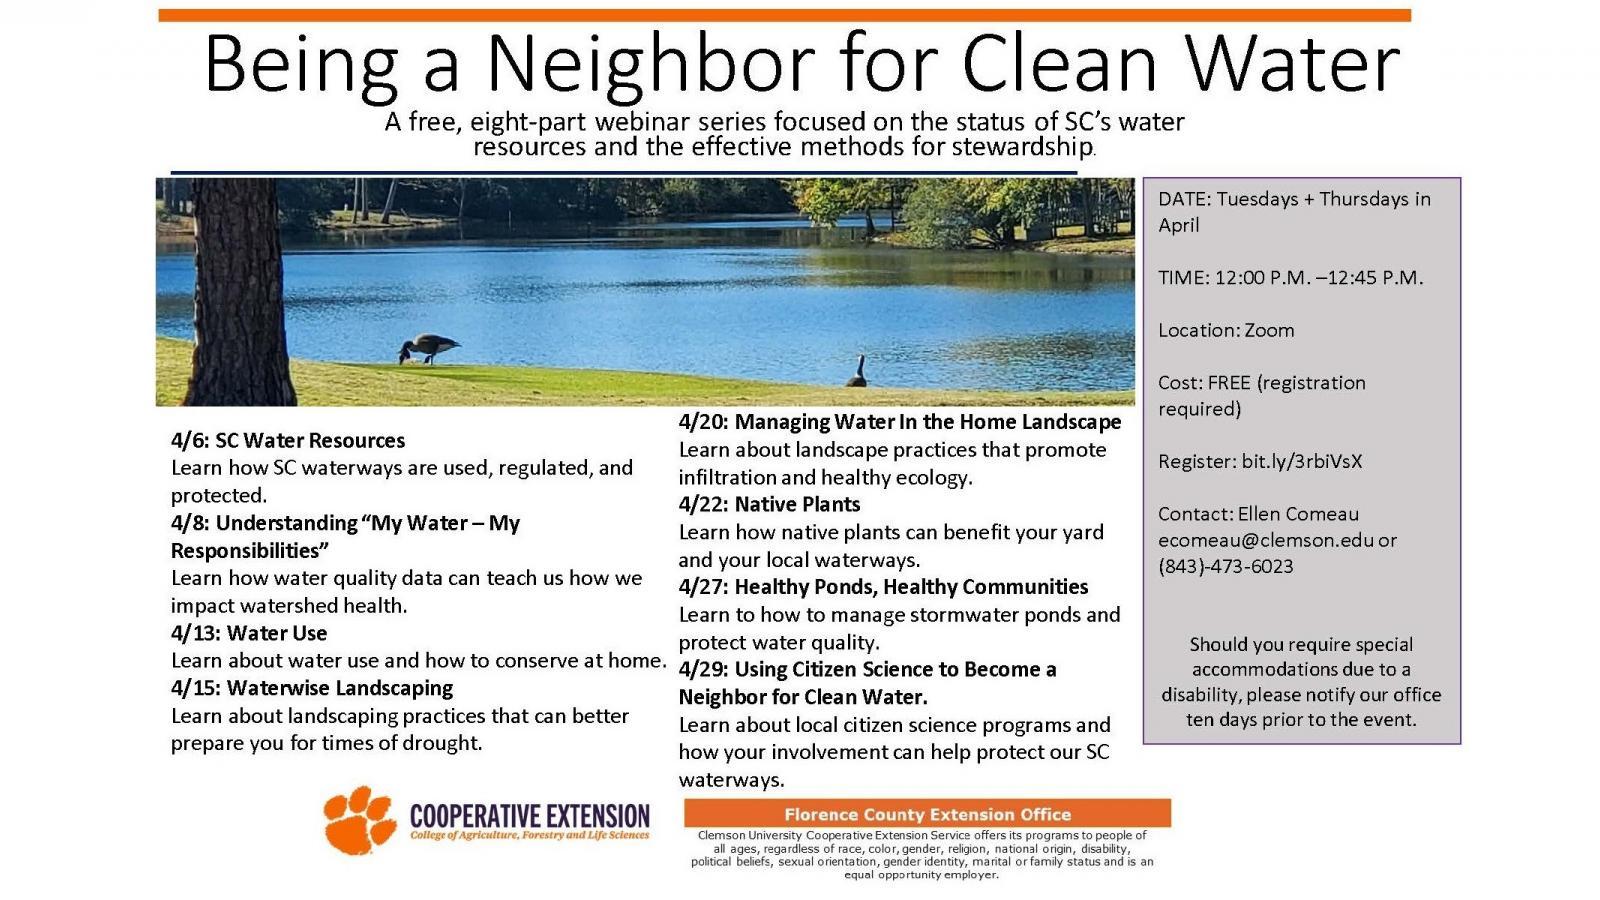 Neighbor for Clean Water Webinar